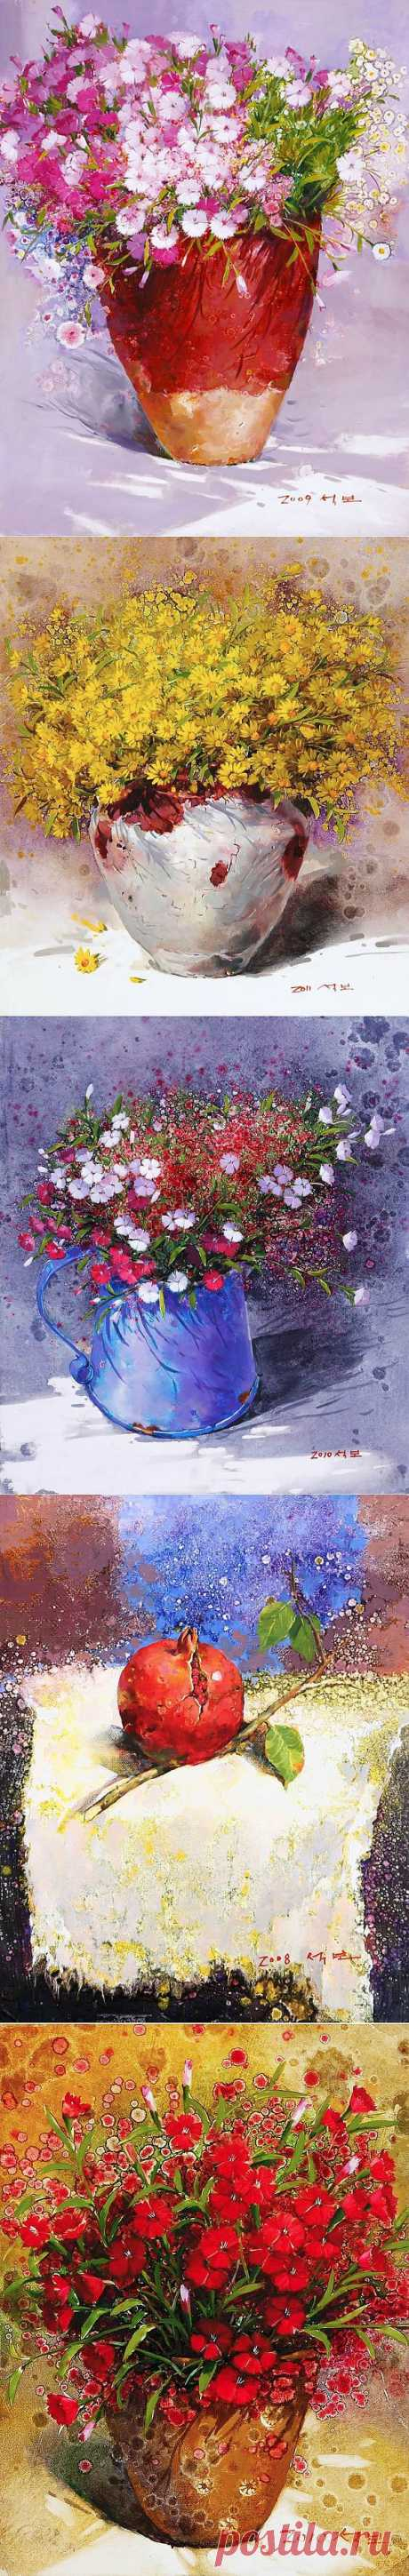 Корейский художник Yi Seong-bu. Натюрморт с цветами | Usenkomaxim.ru